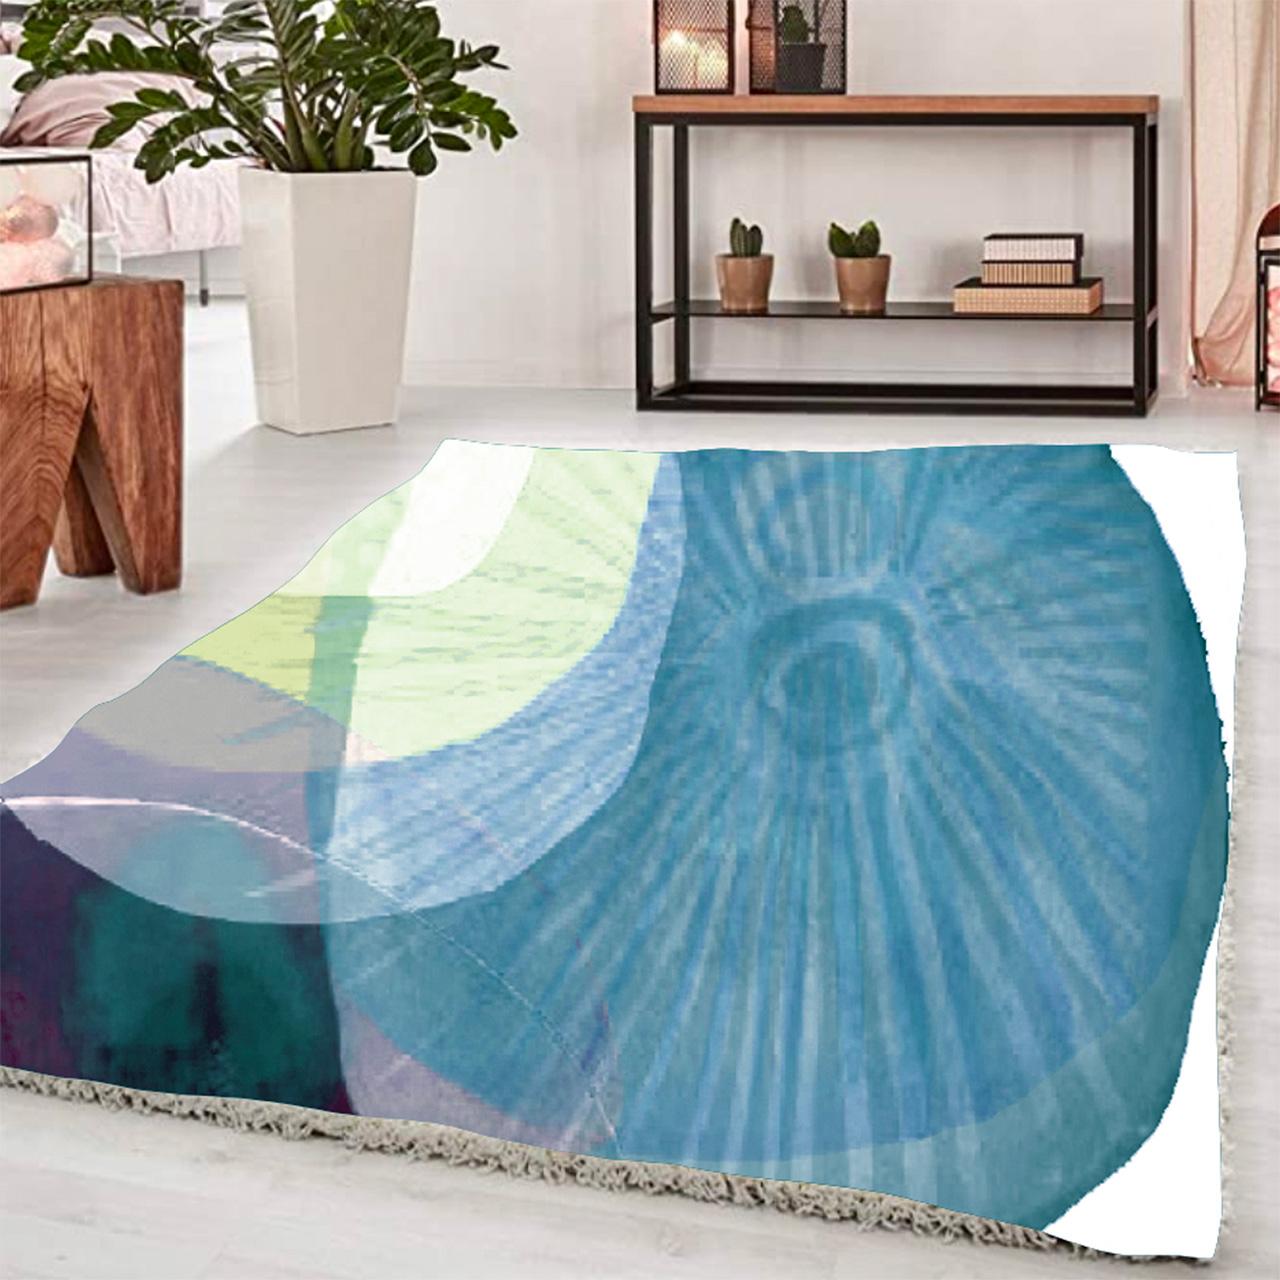 ivana-helsinki-modern-rugs